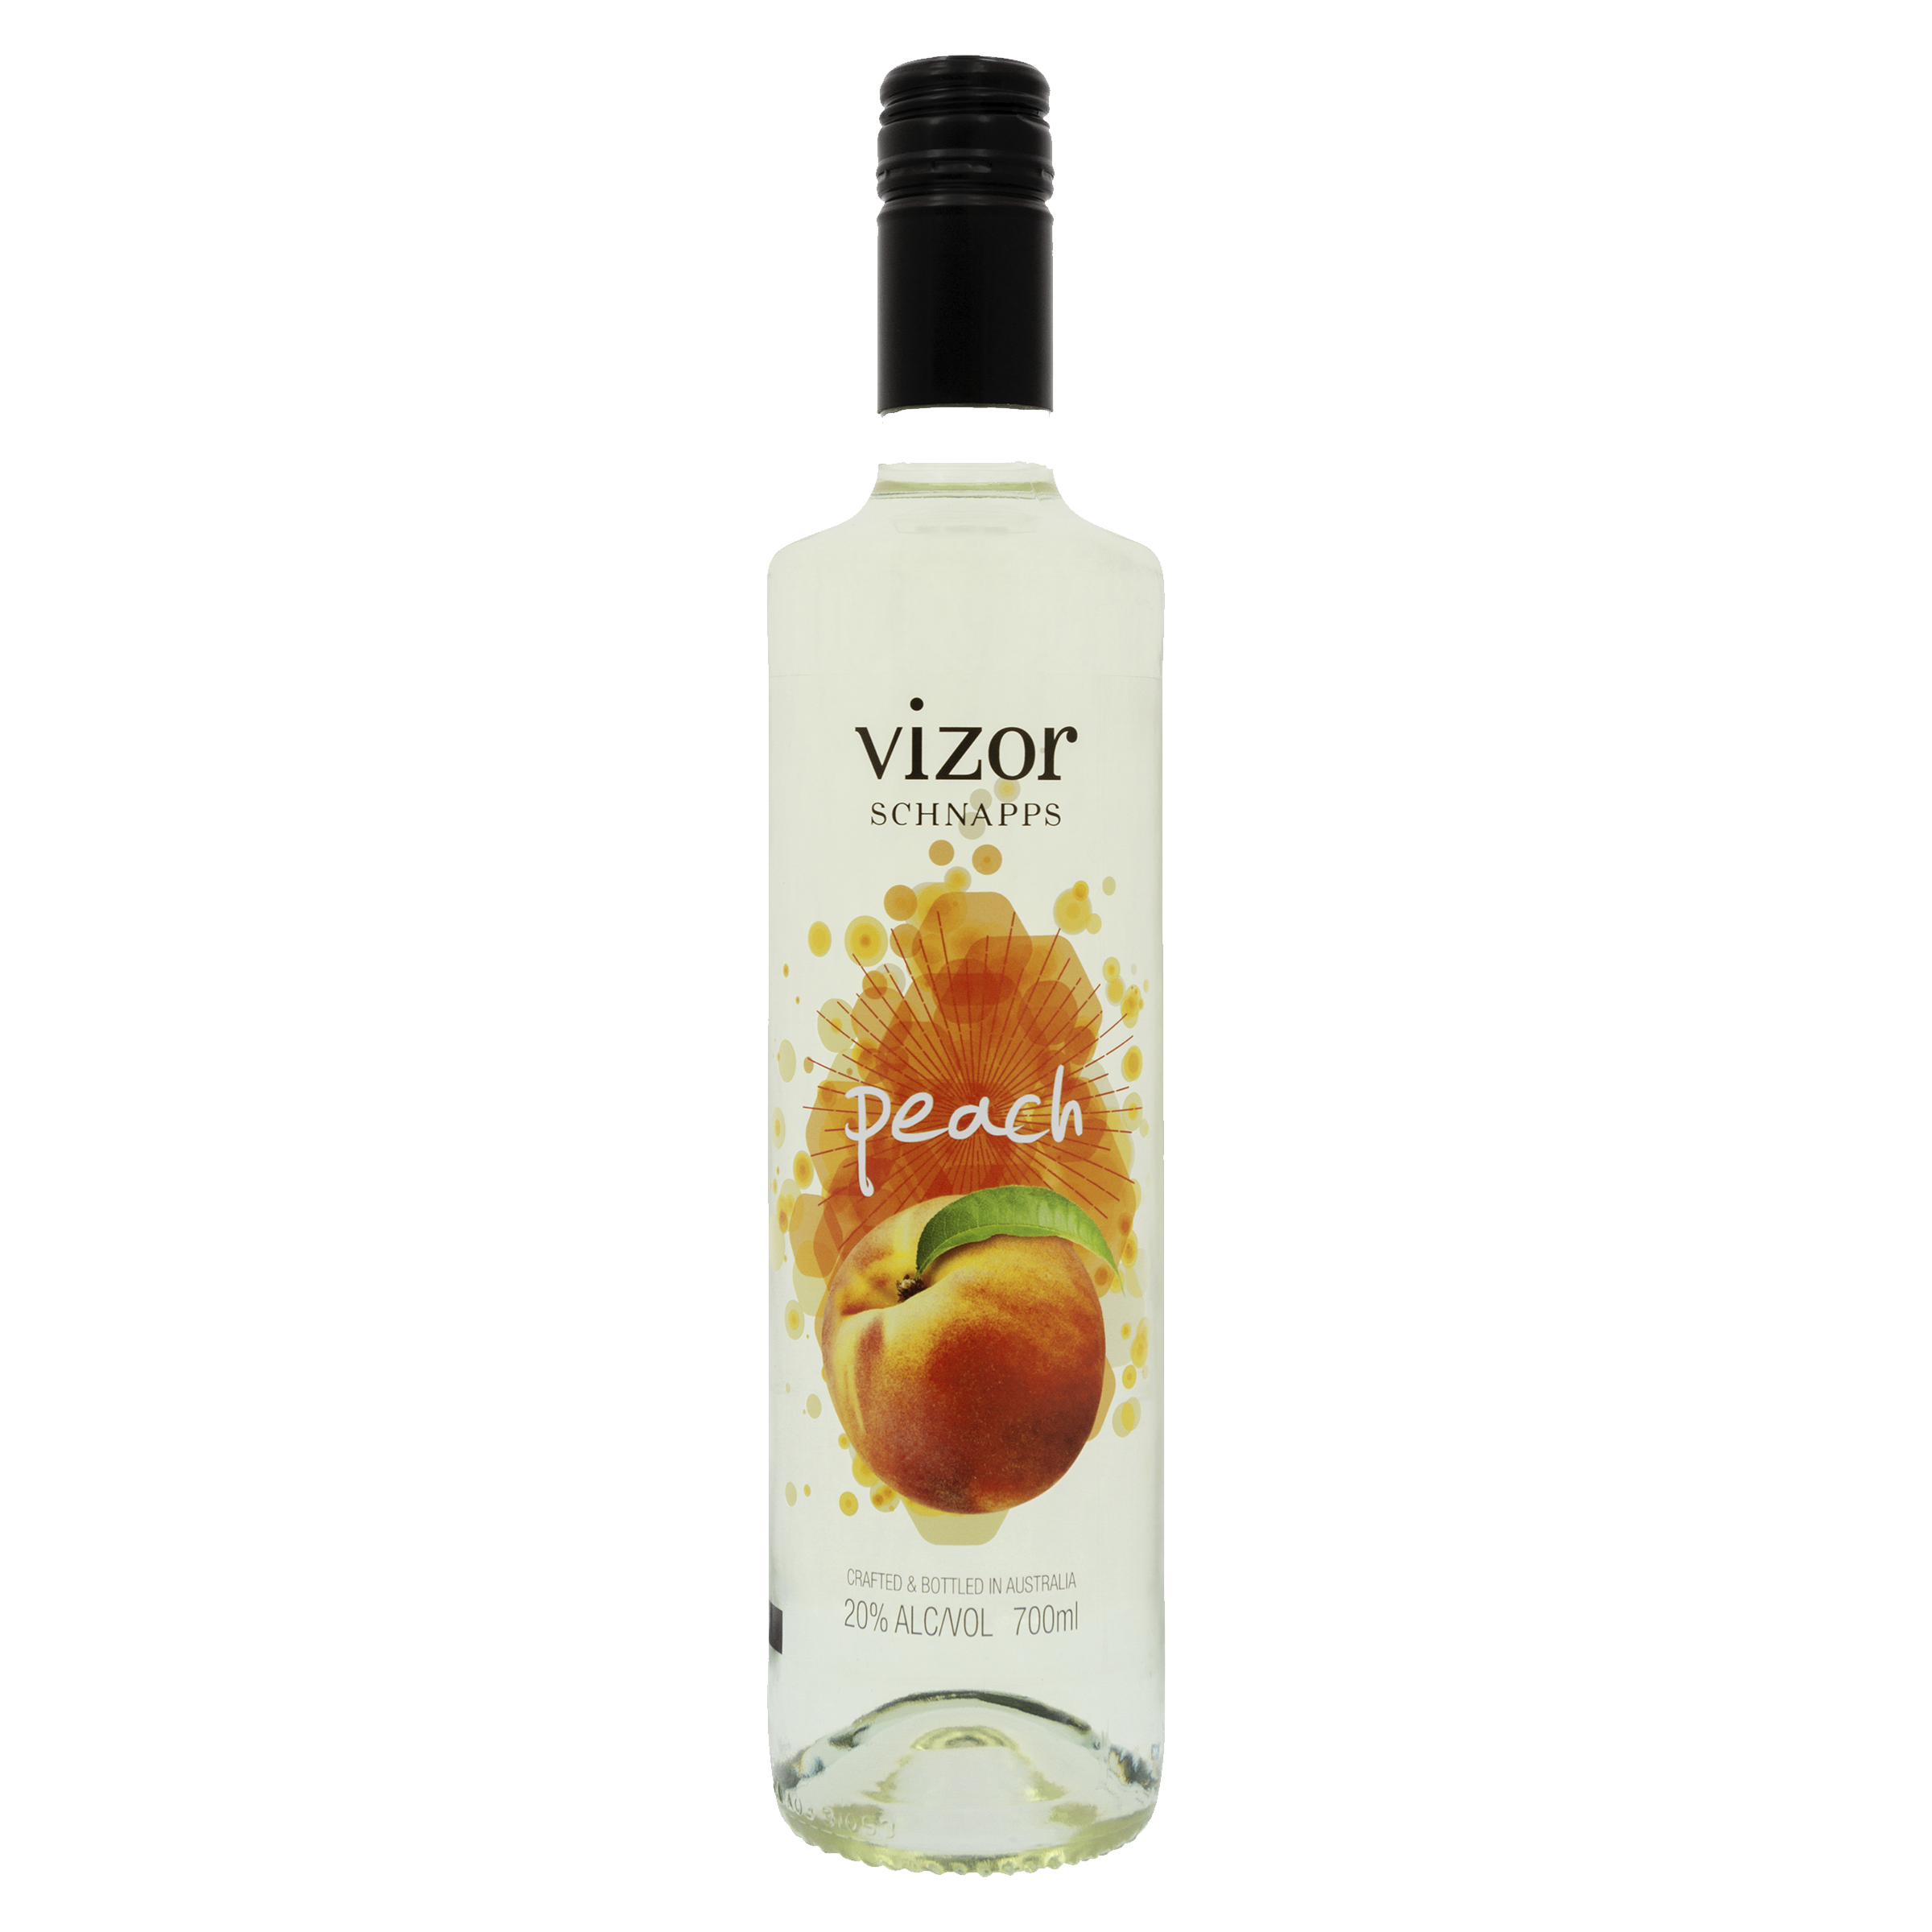 Vizor Peach Schnapps 700ml